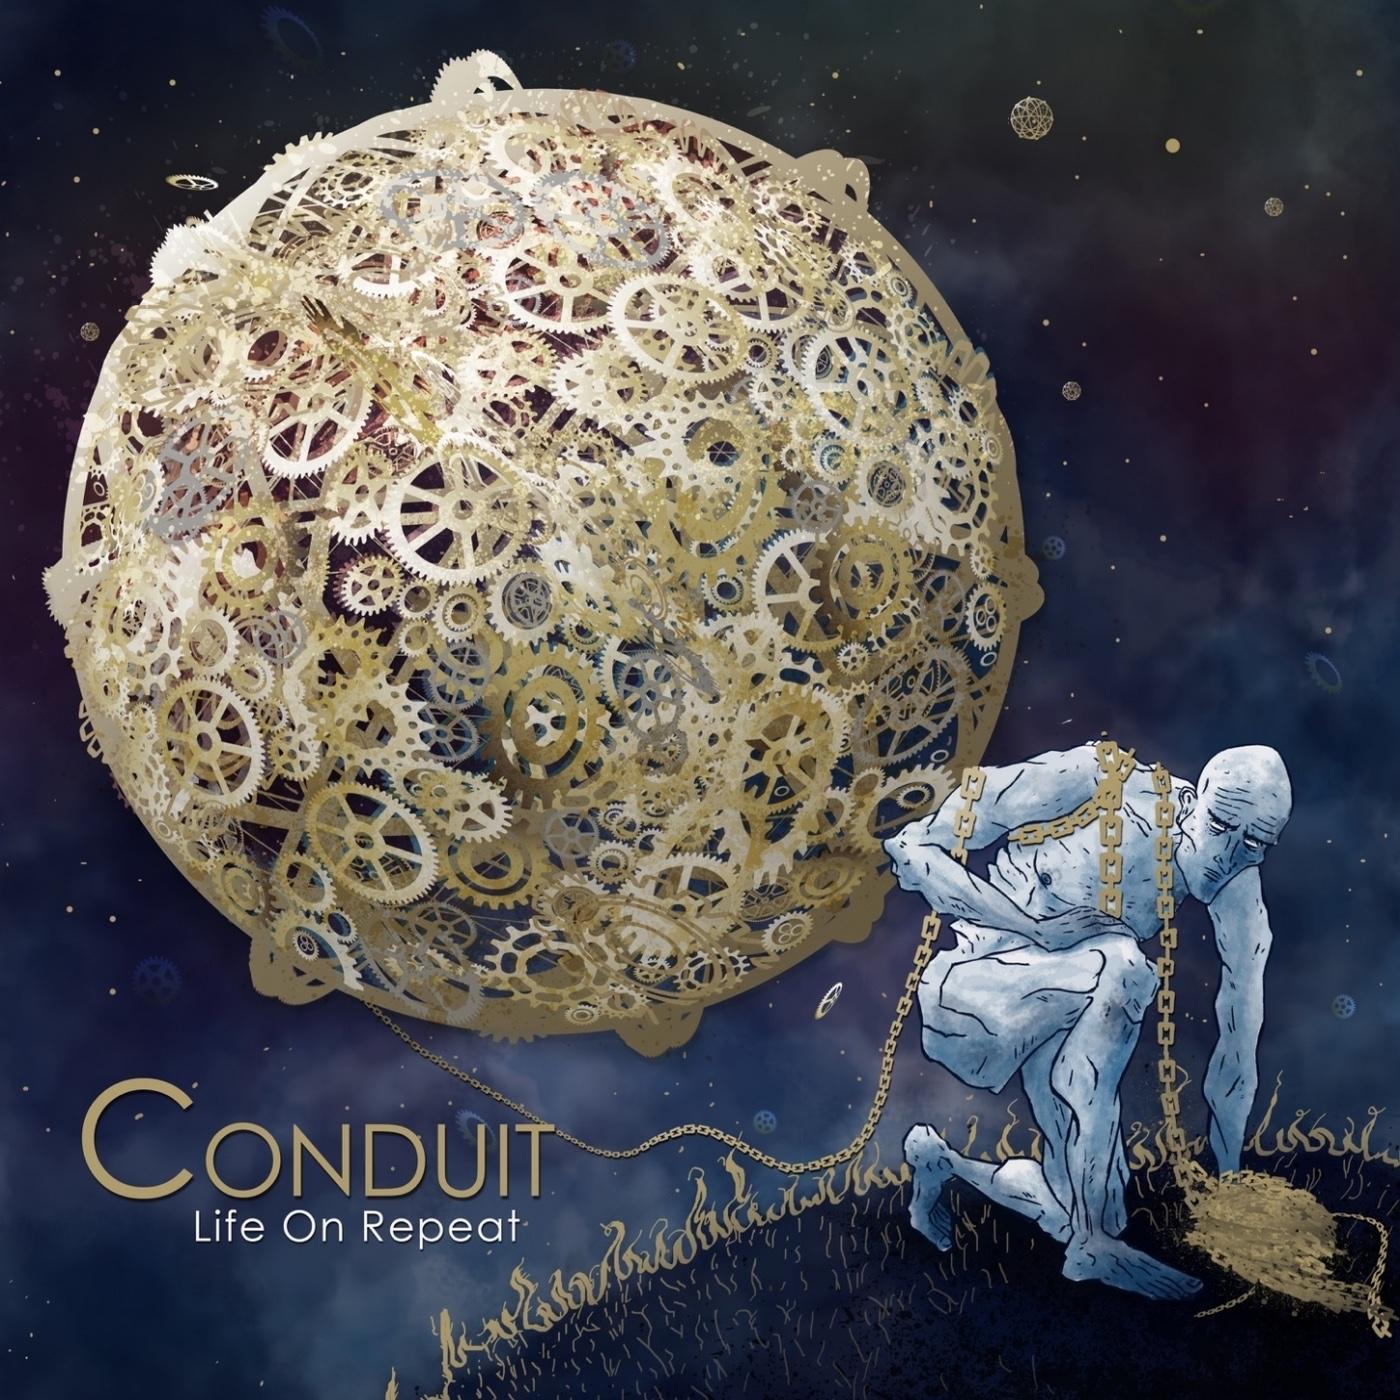 Conduit - Life On Repeat (2015)